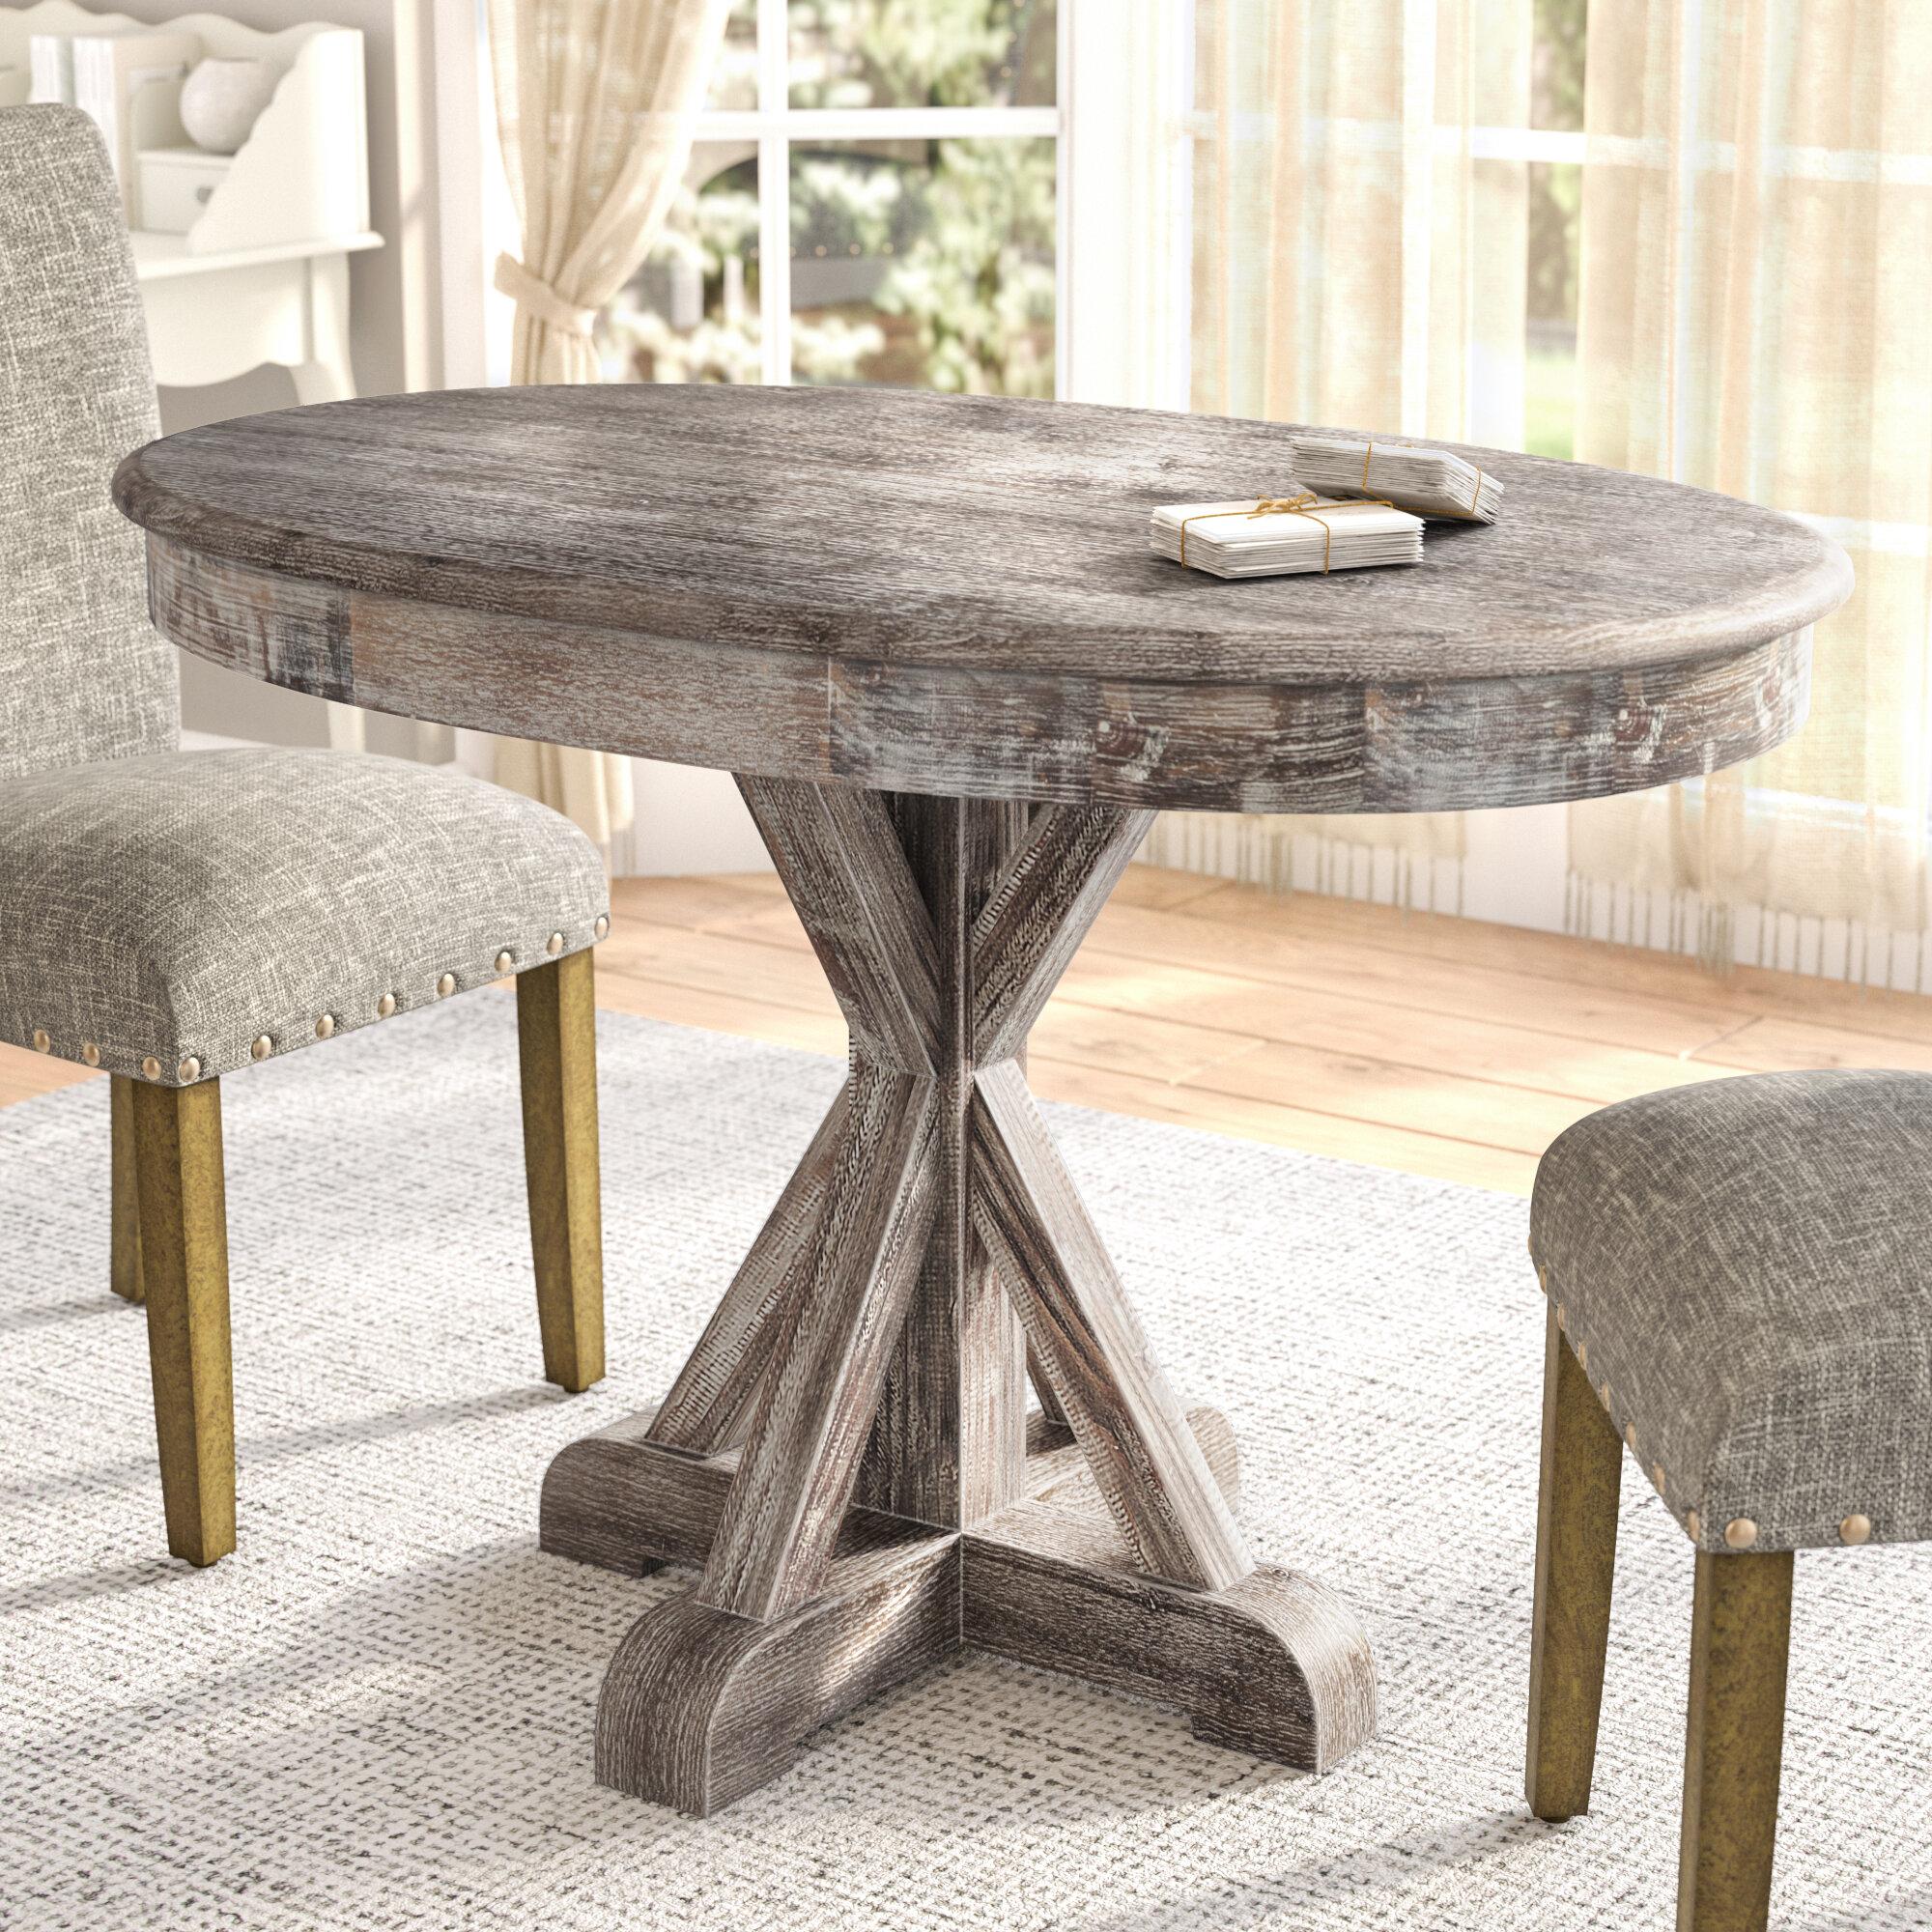 Shop Our Sites & Greyleigh Maryanne Oval Dining Table \u0026 Reviews | Wayfair